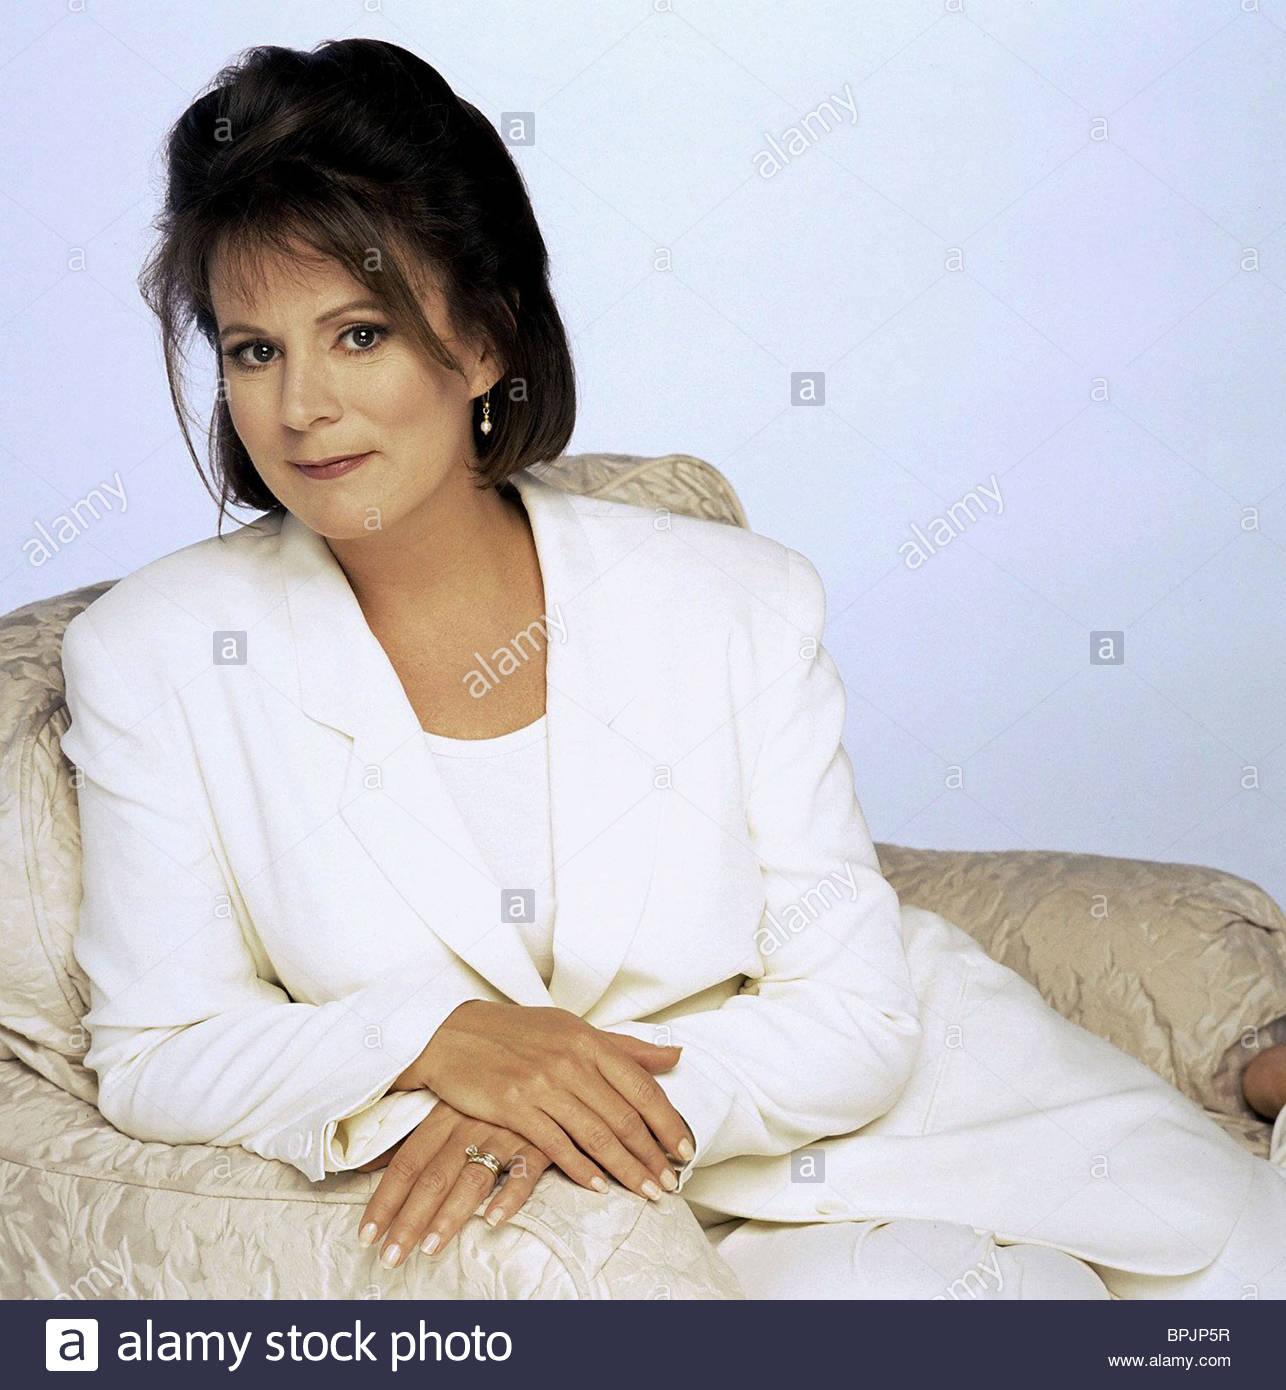 PATRICIA RICHARDSON HOME IMPROVEMENT (1991 Stock Photo